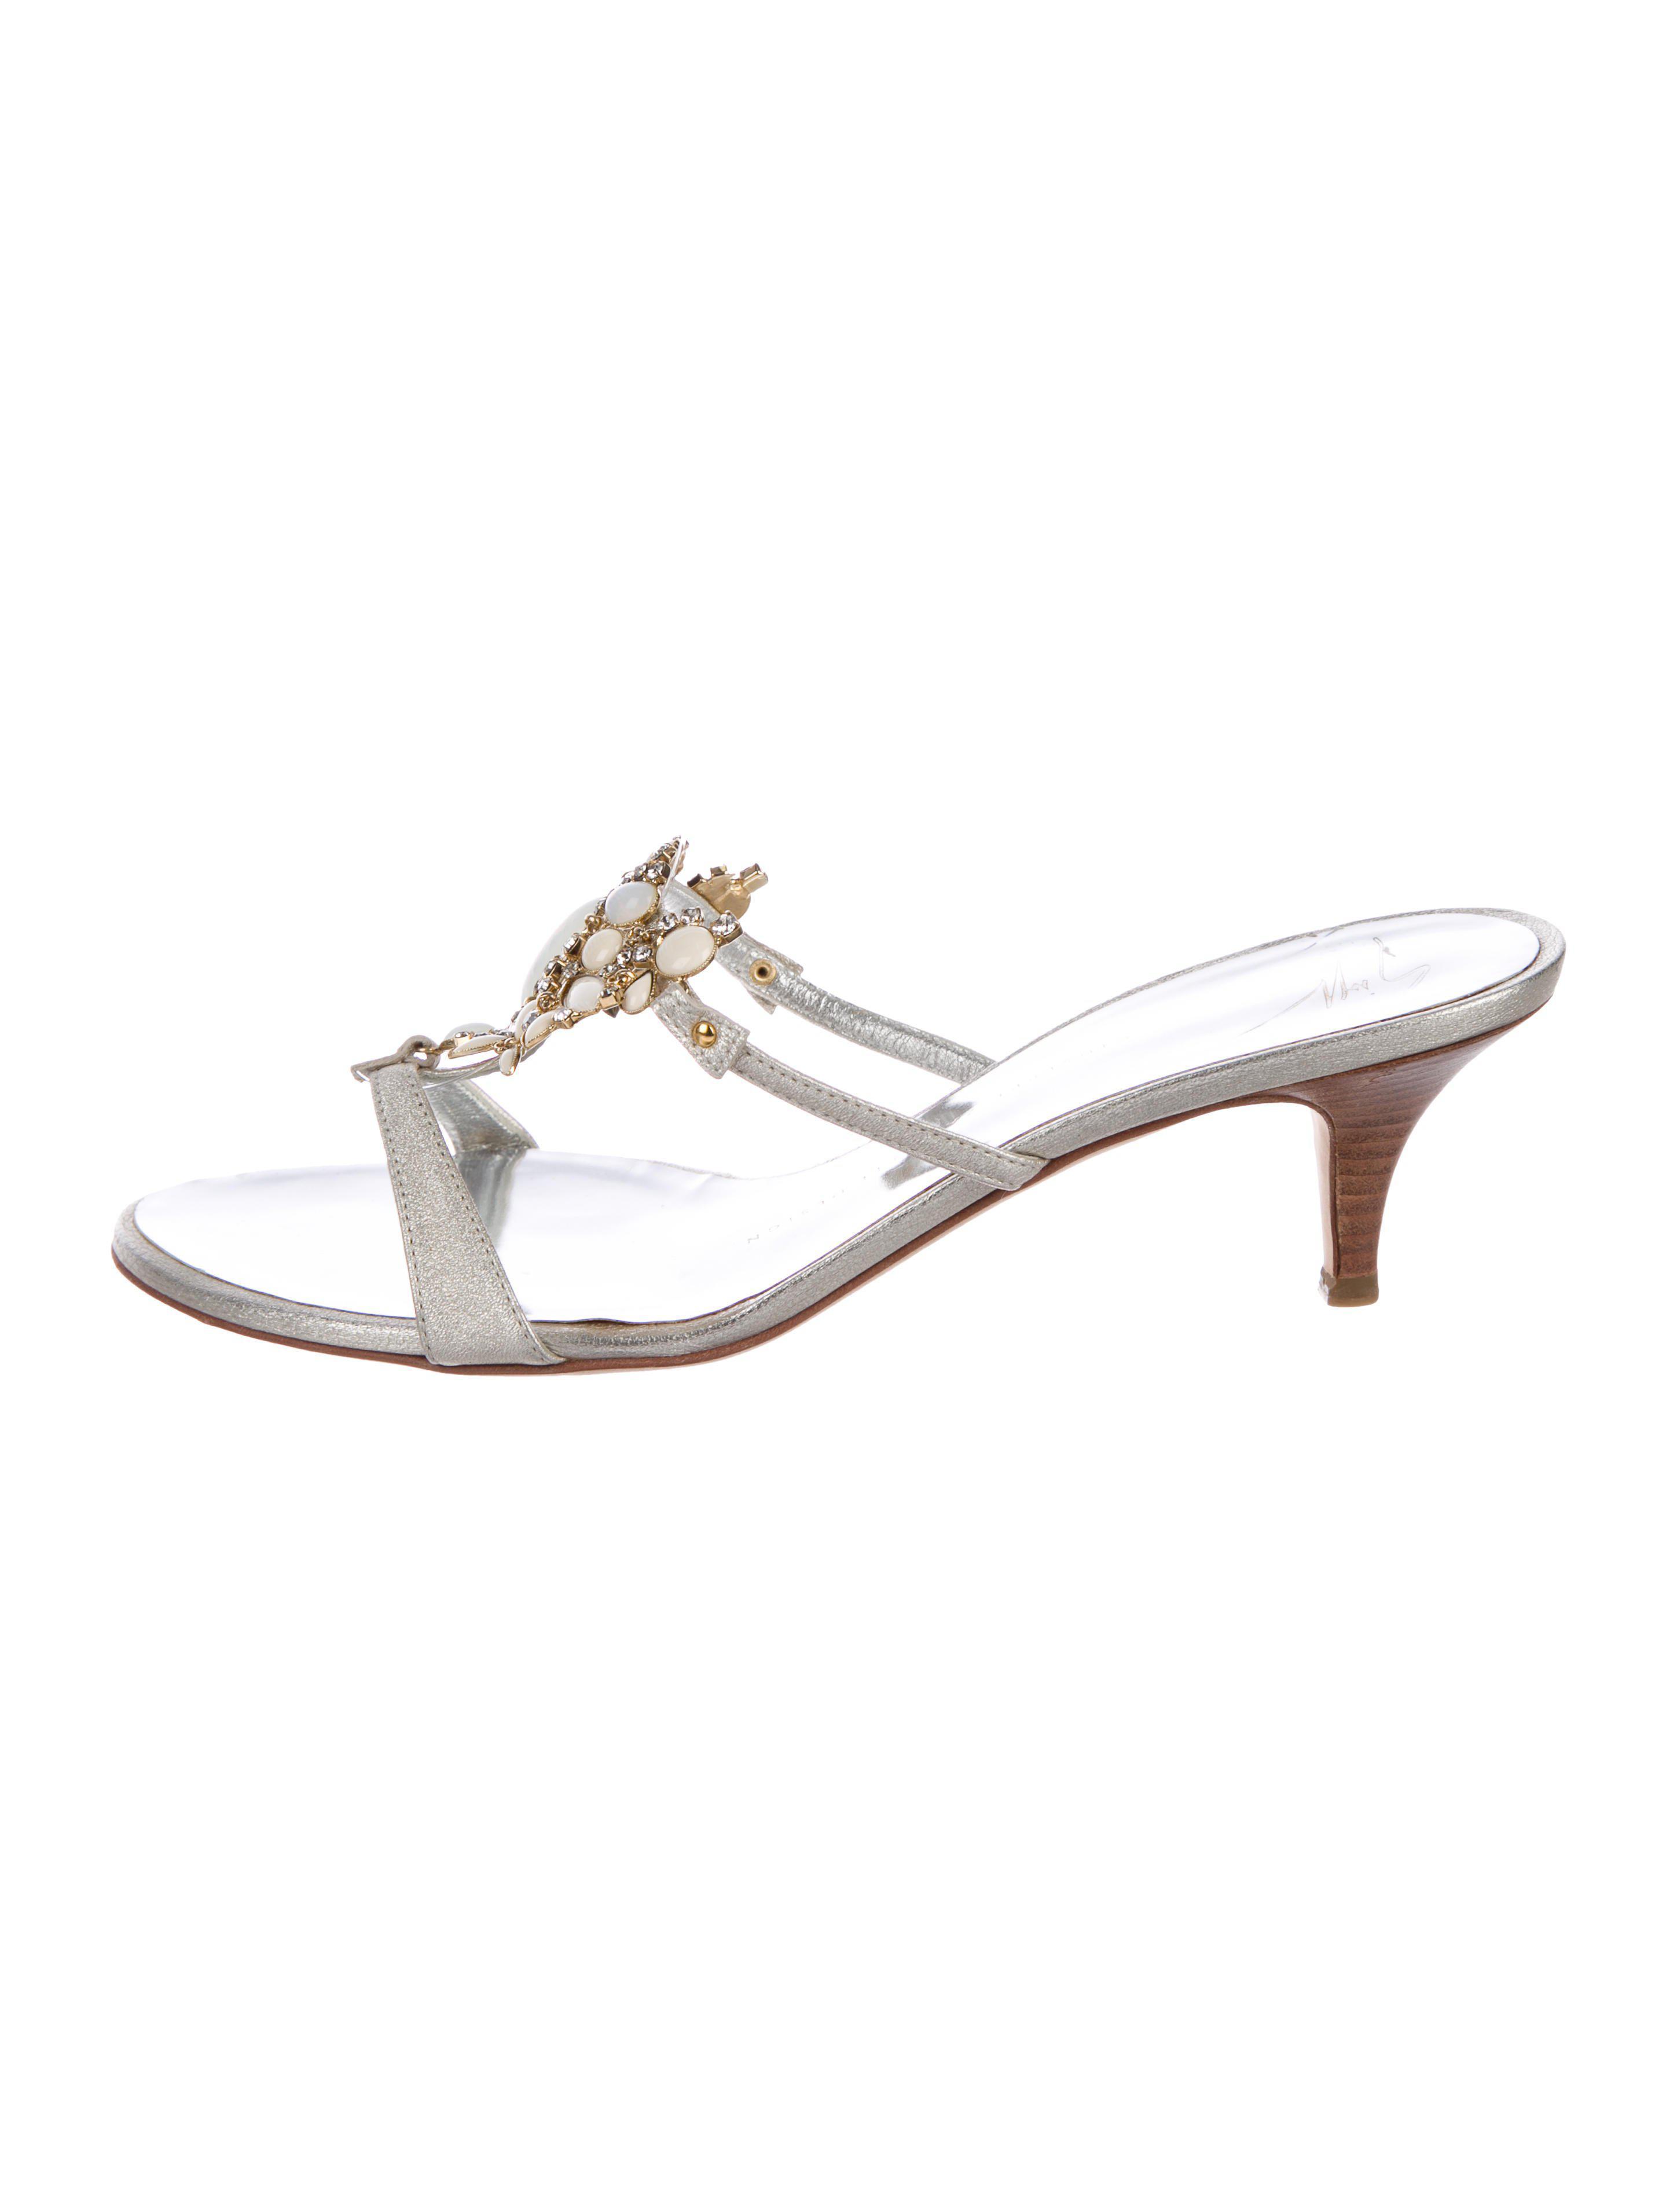 8fa7b49573bfe5 Lyst - Giuseppe Zanotti Embellished Leather Sandals Silver in Metallic